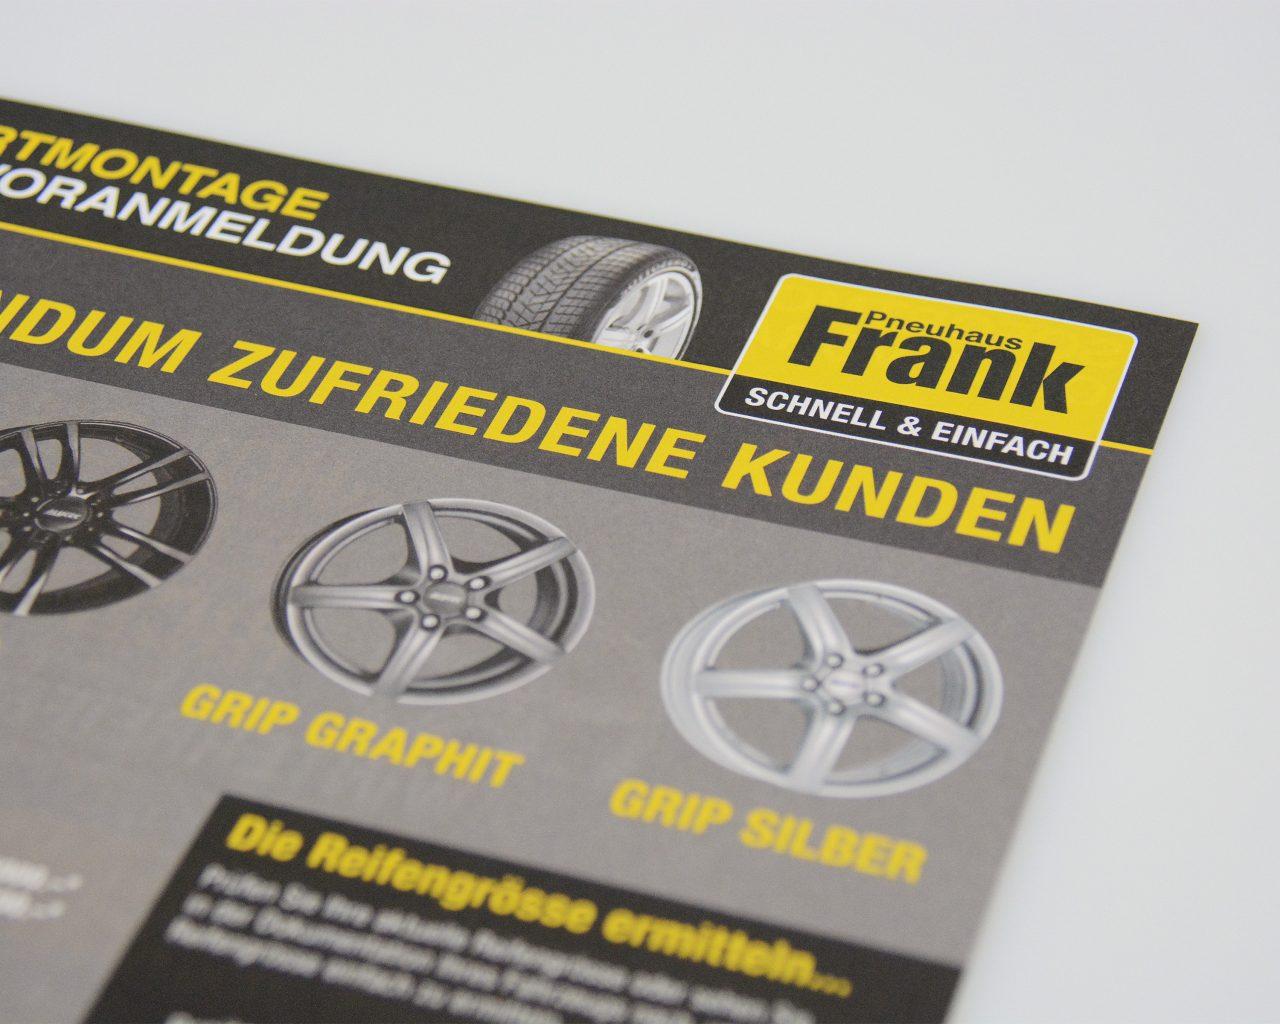 pneuhausfrank-05